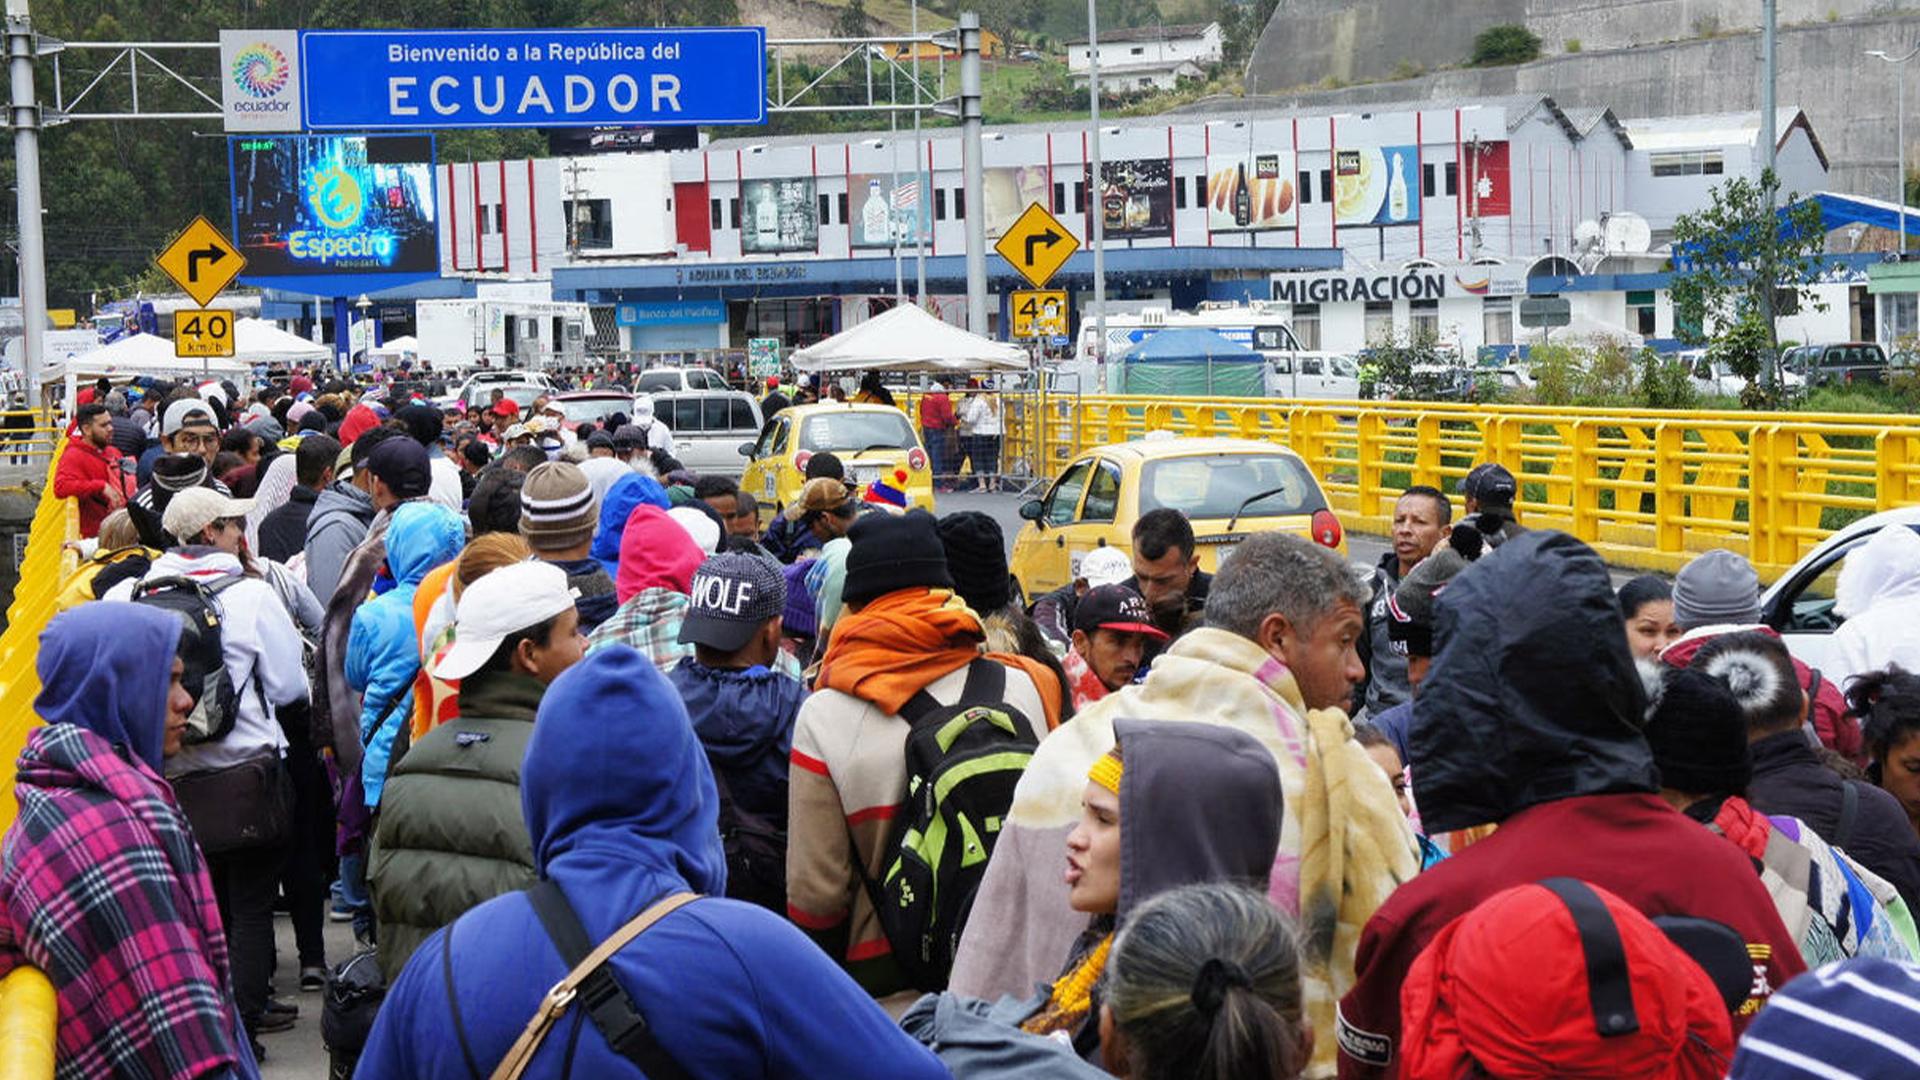 Venezolanos huyen a pie de Guayaquil ante la falta de empleo